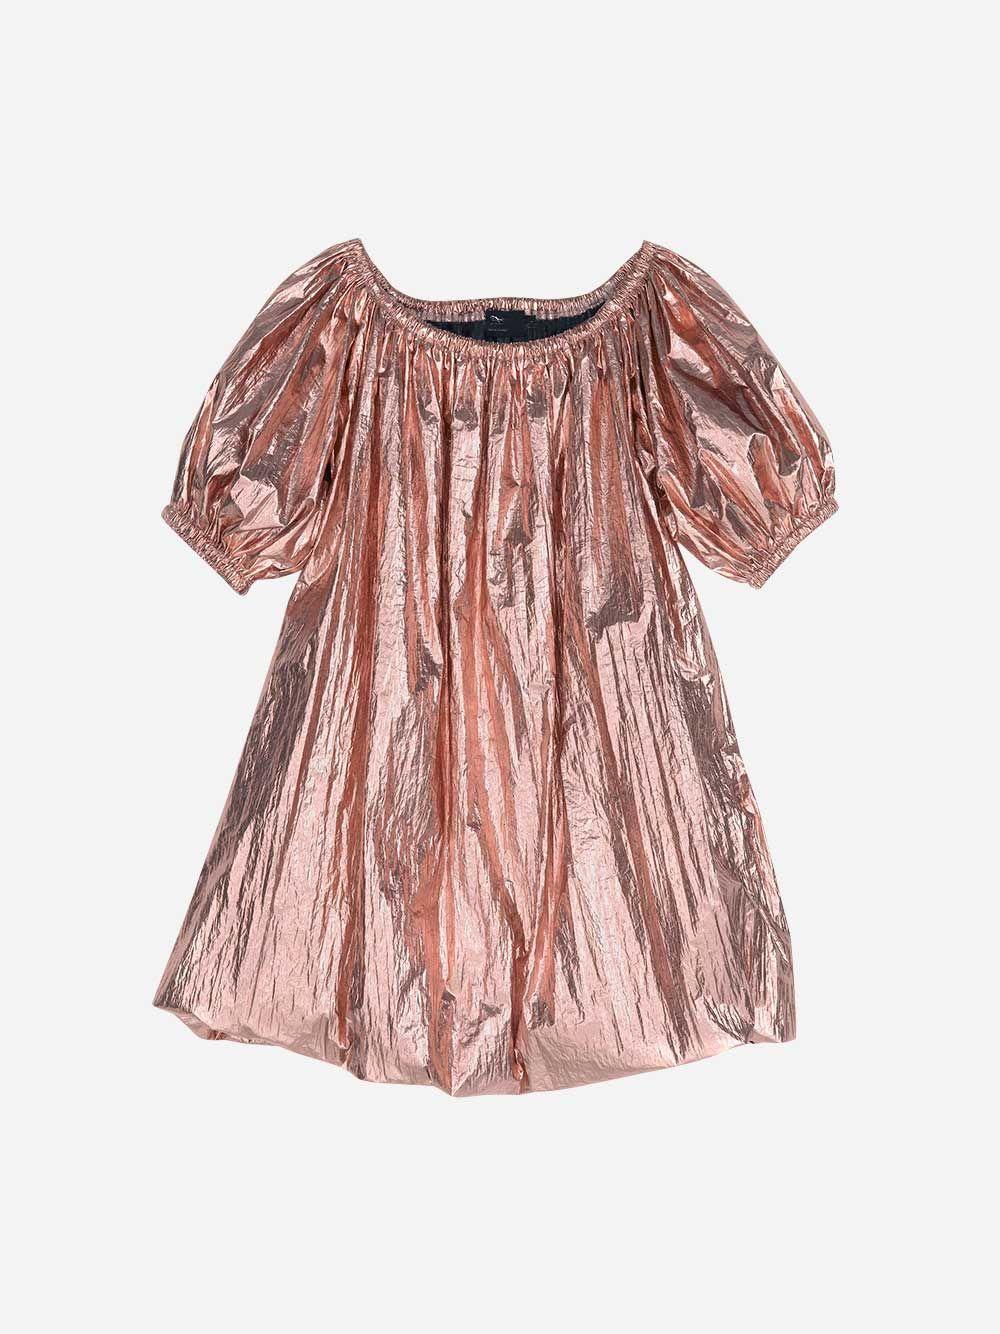 Oversized Metallic Dress | Andorine